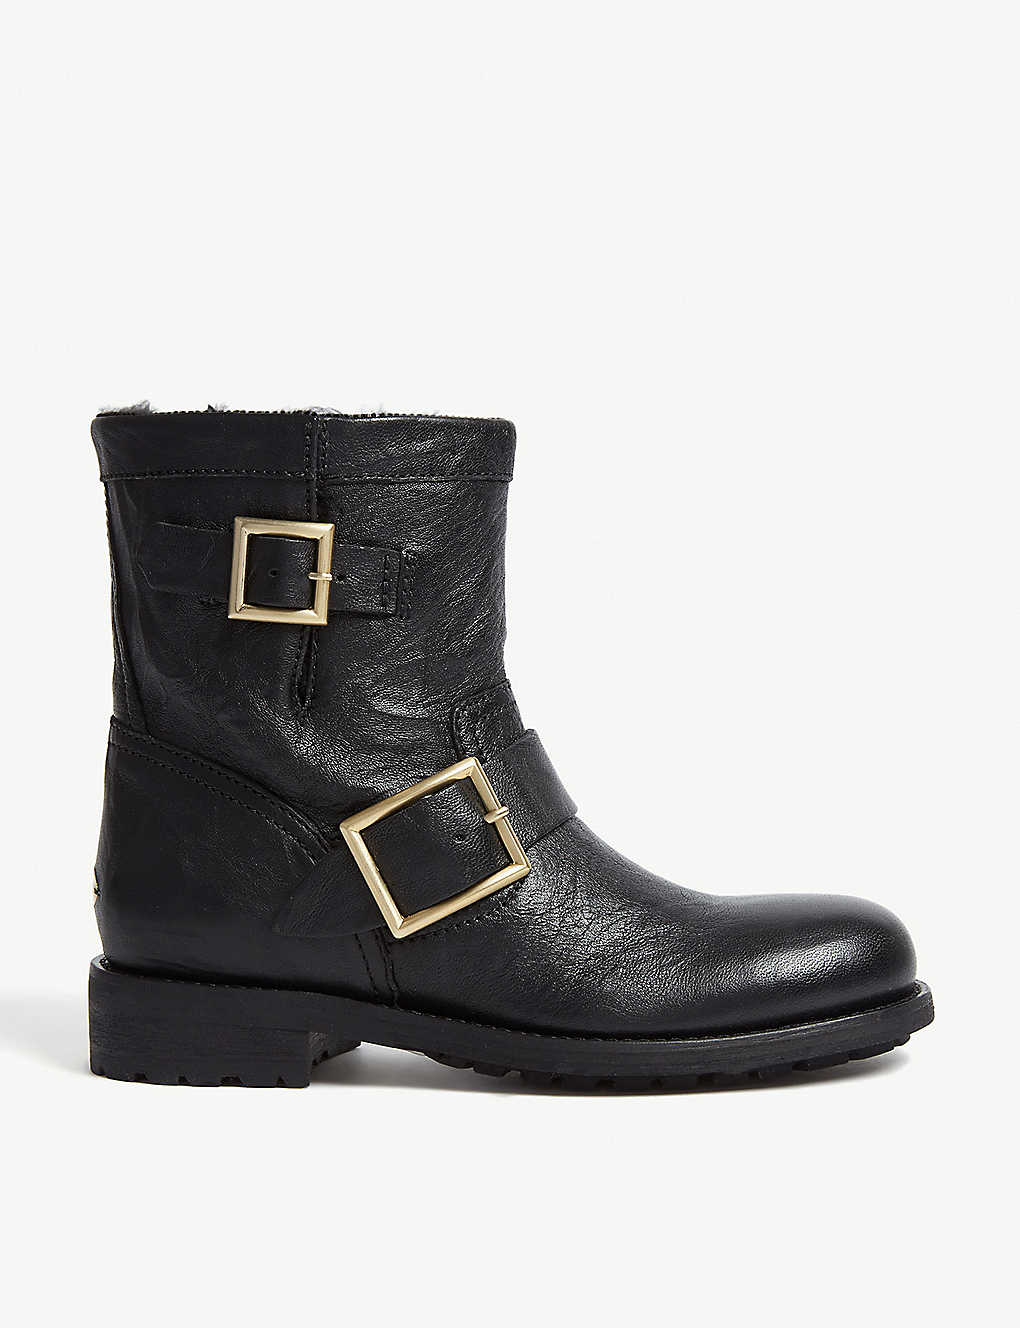 913d2f18f145 JIMMY CHOO - Youth leather biker boots